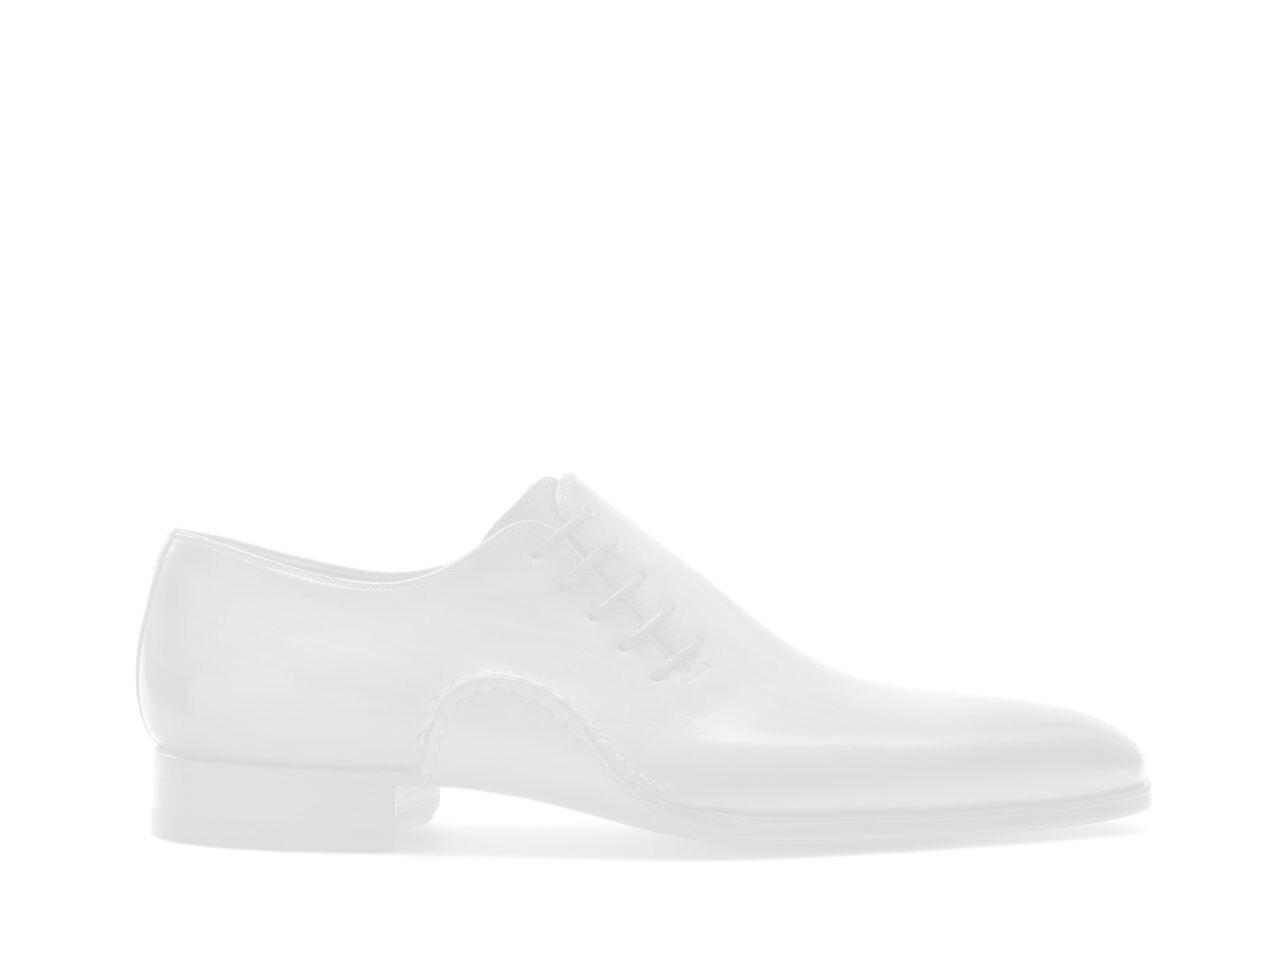 Pair of the Magnanni Lennon Grey Men's Single Monk Strap Shoes